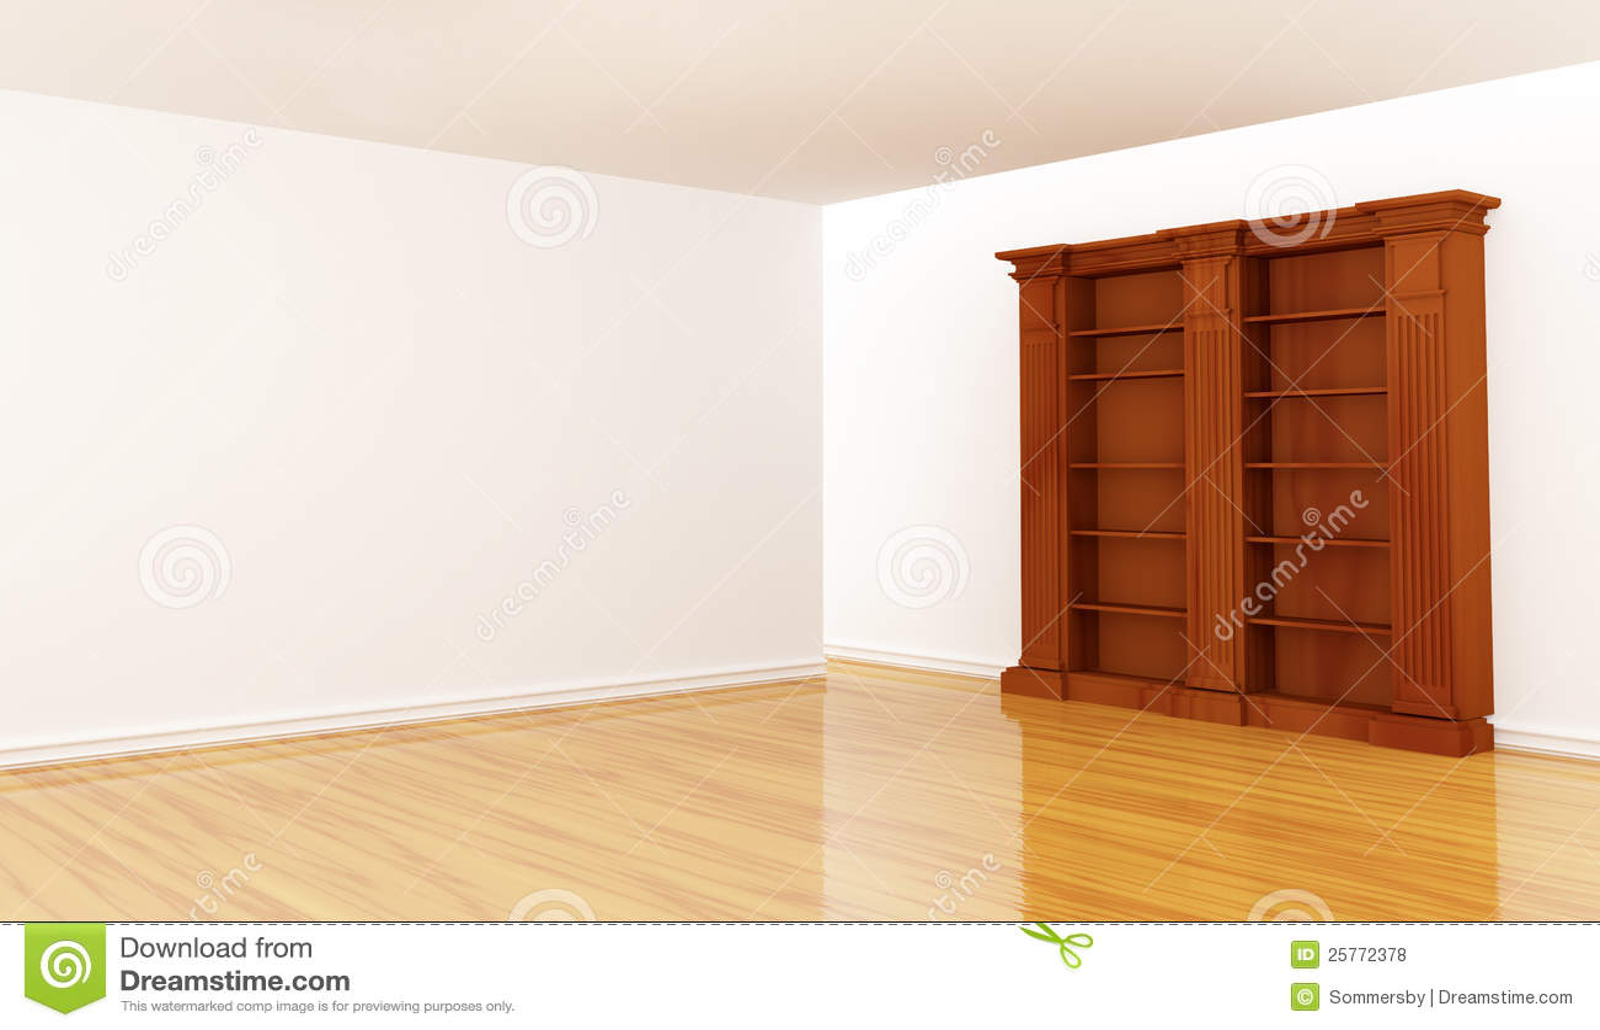 Bookshelf In Minimalist Interior